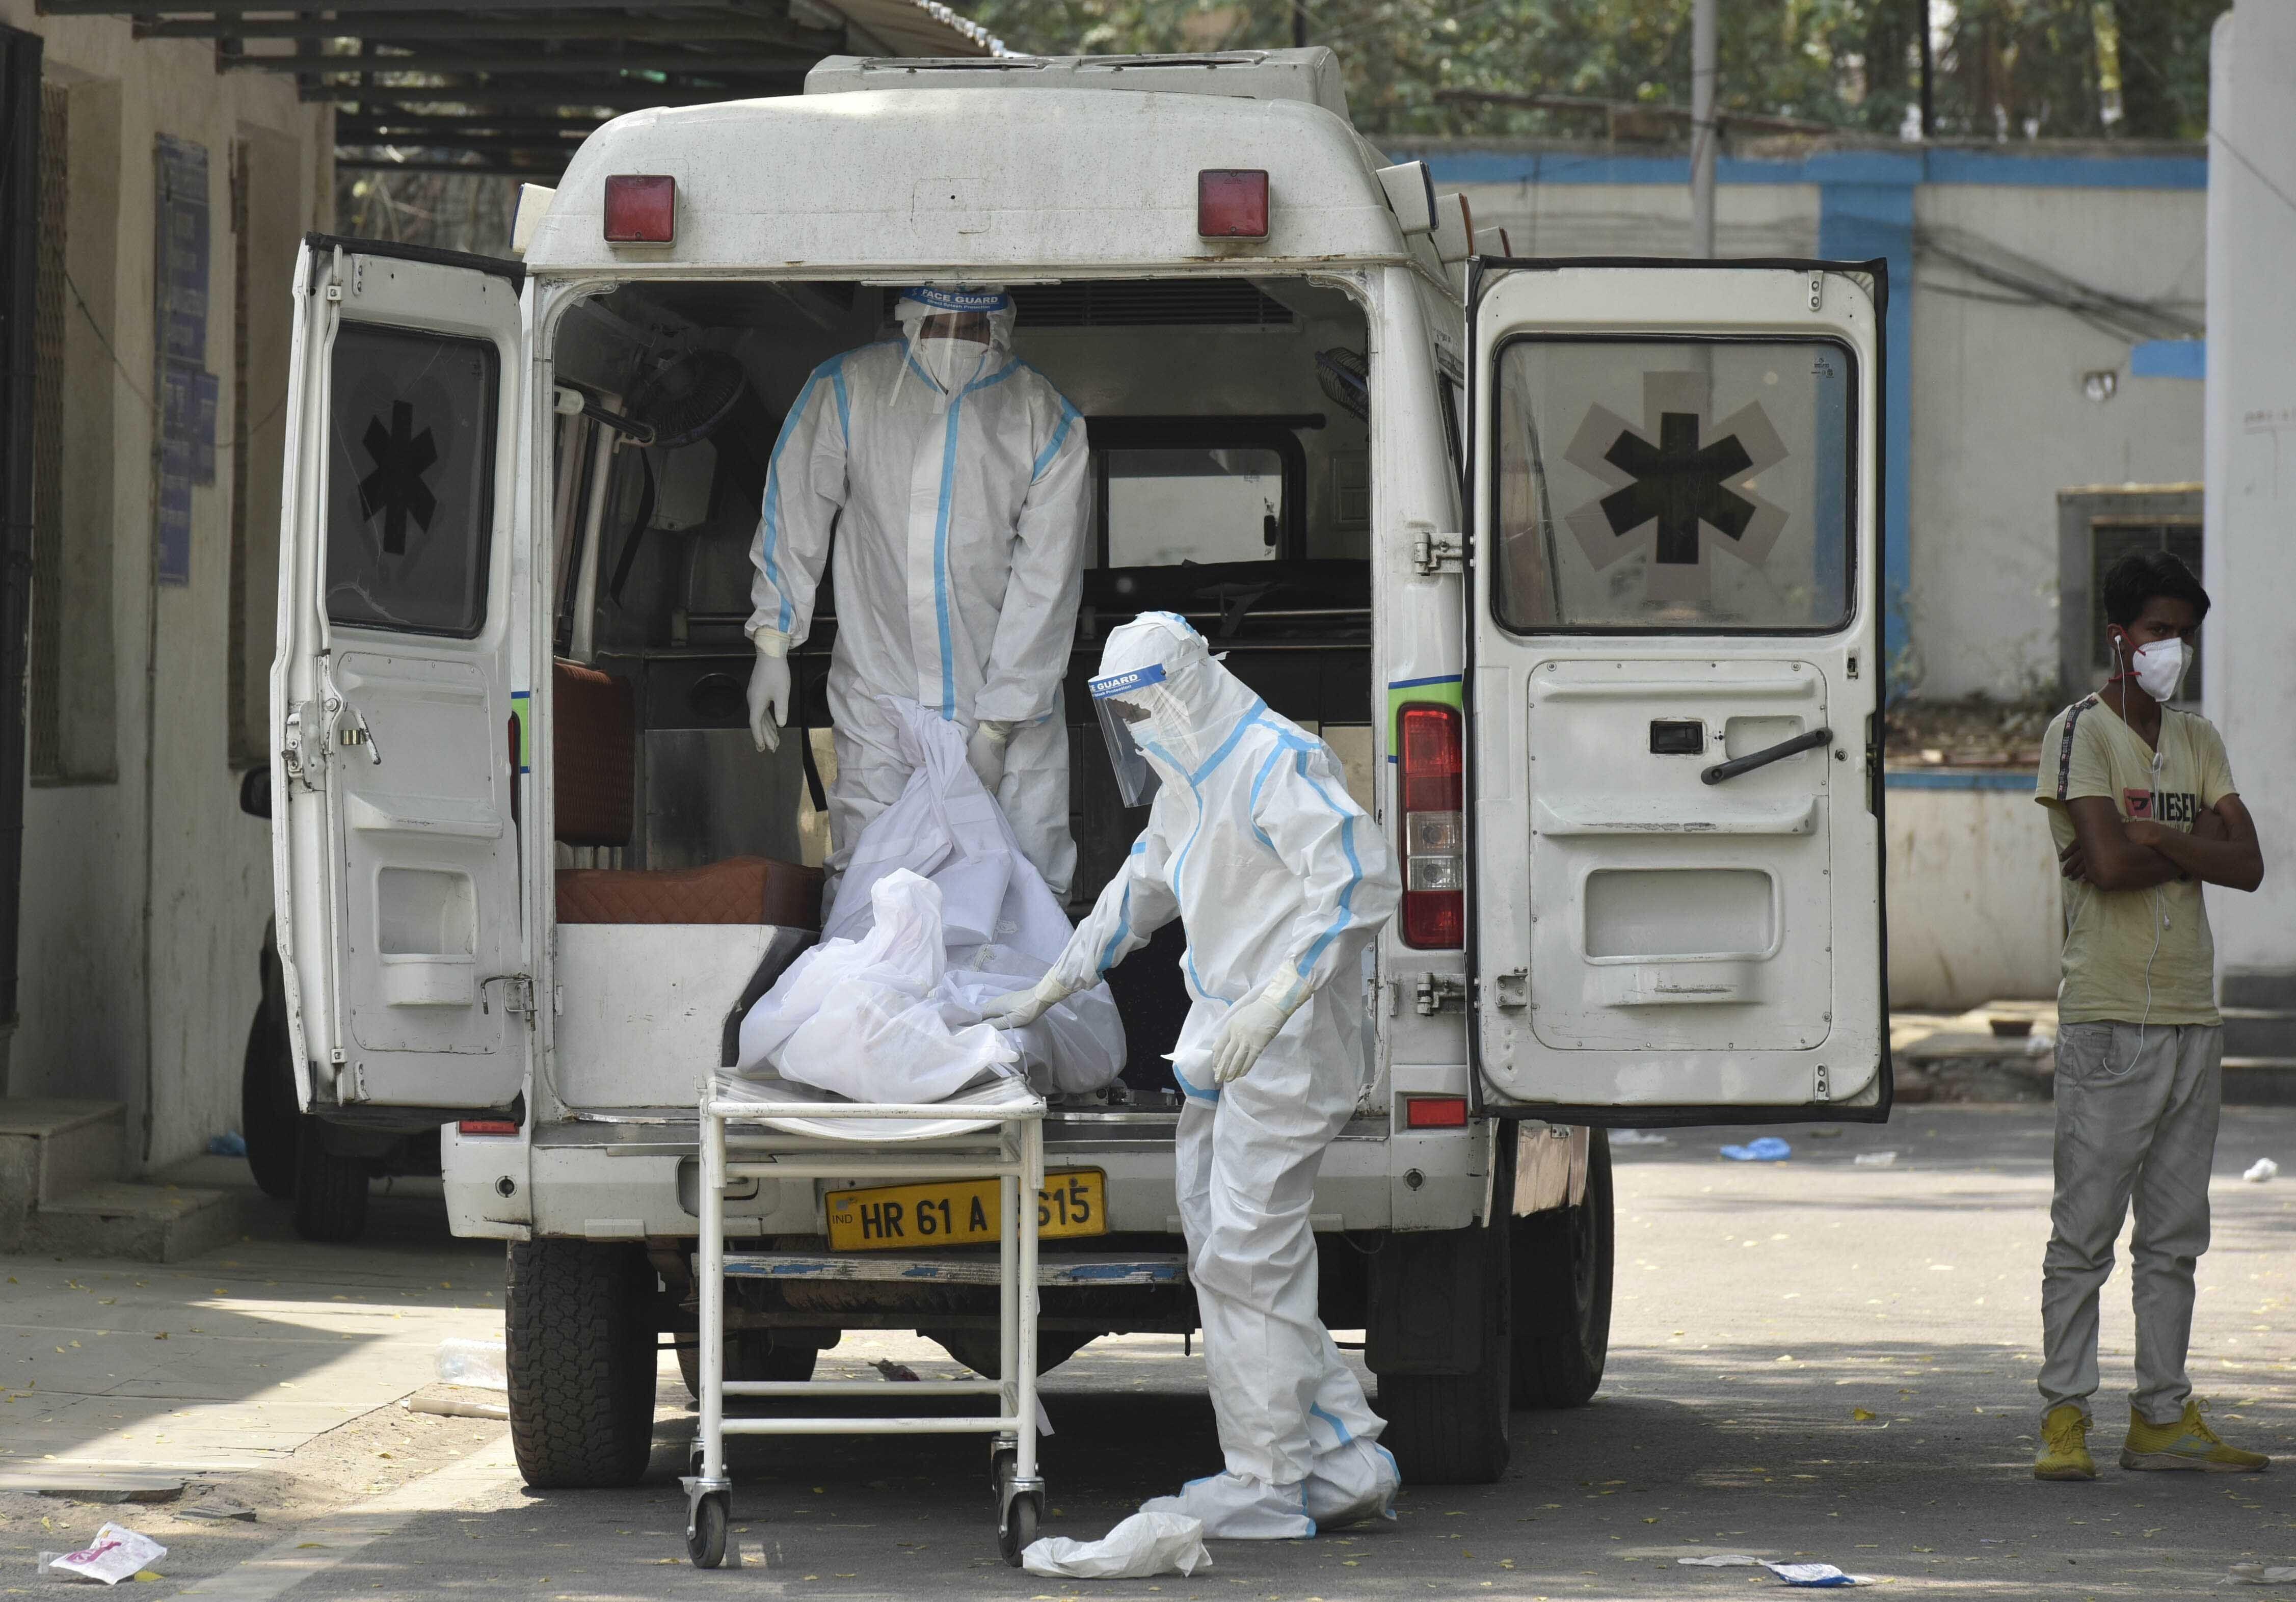 NEW DELHI, INDIA - APRIL 29: Hospital staff members shift dead body of a COVID-19 patient into an ambulance at Maulana Azad M